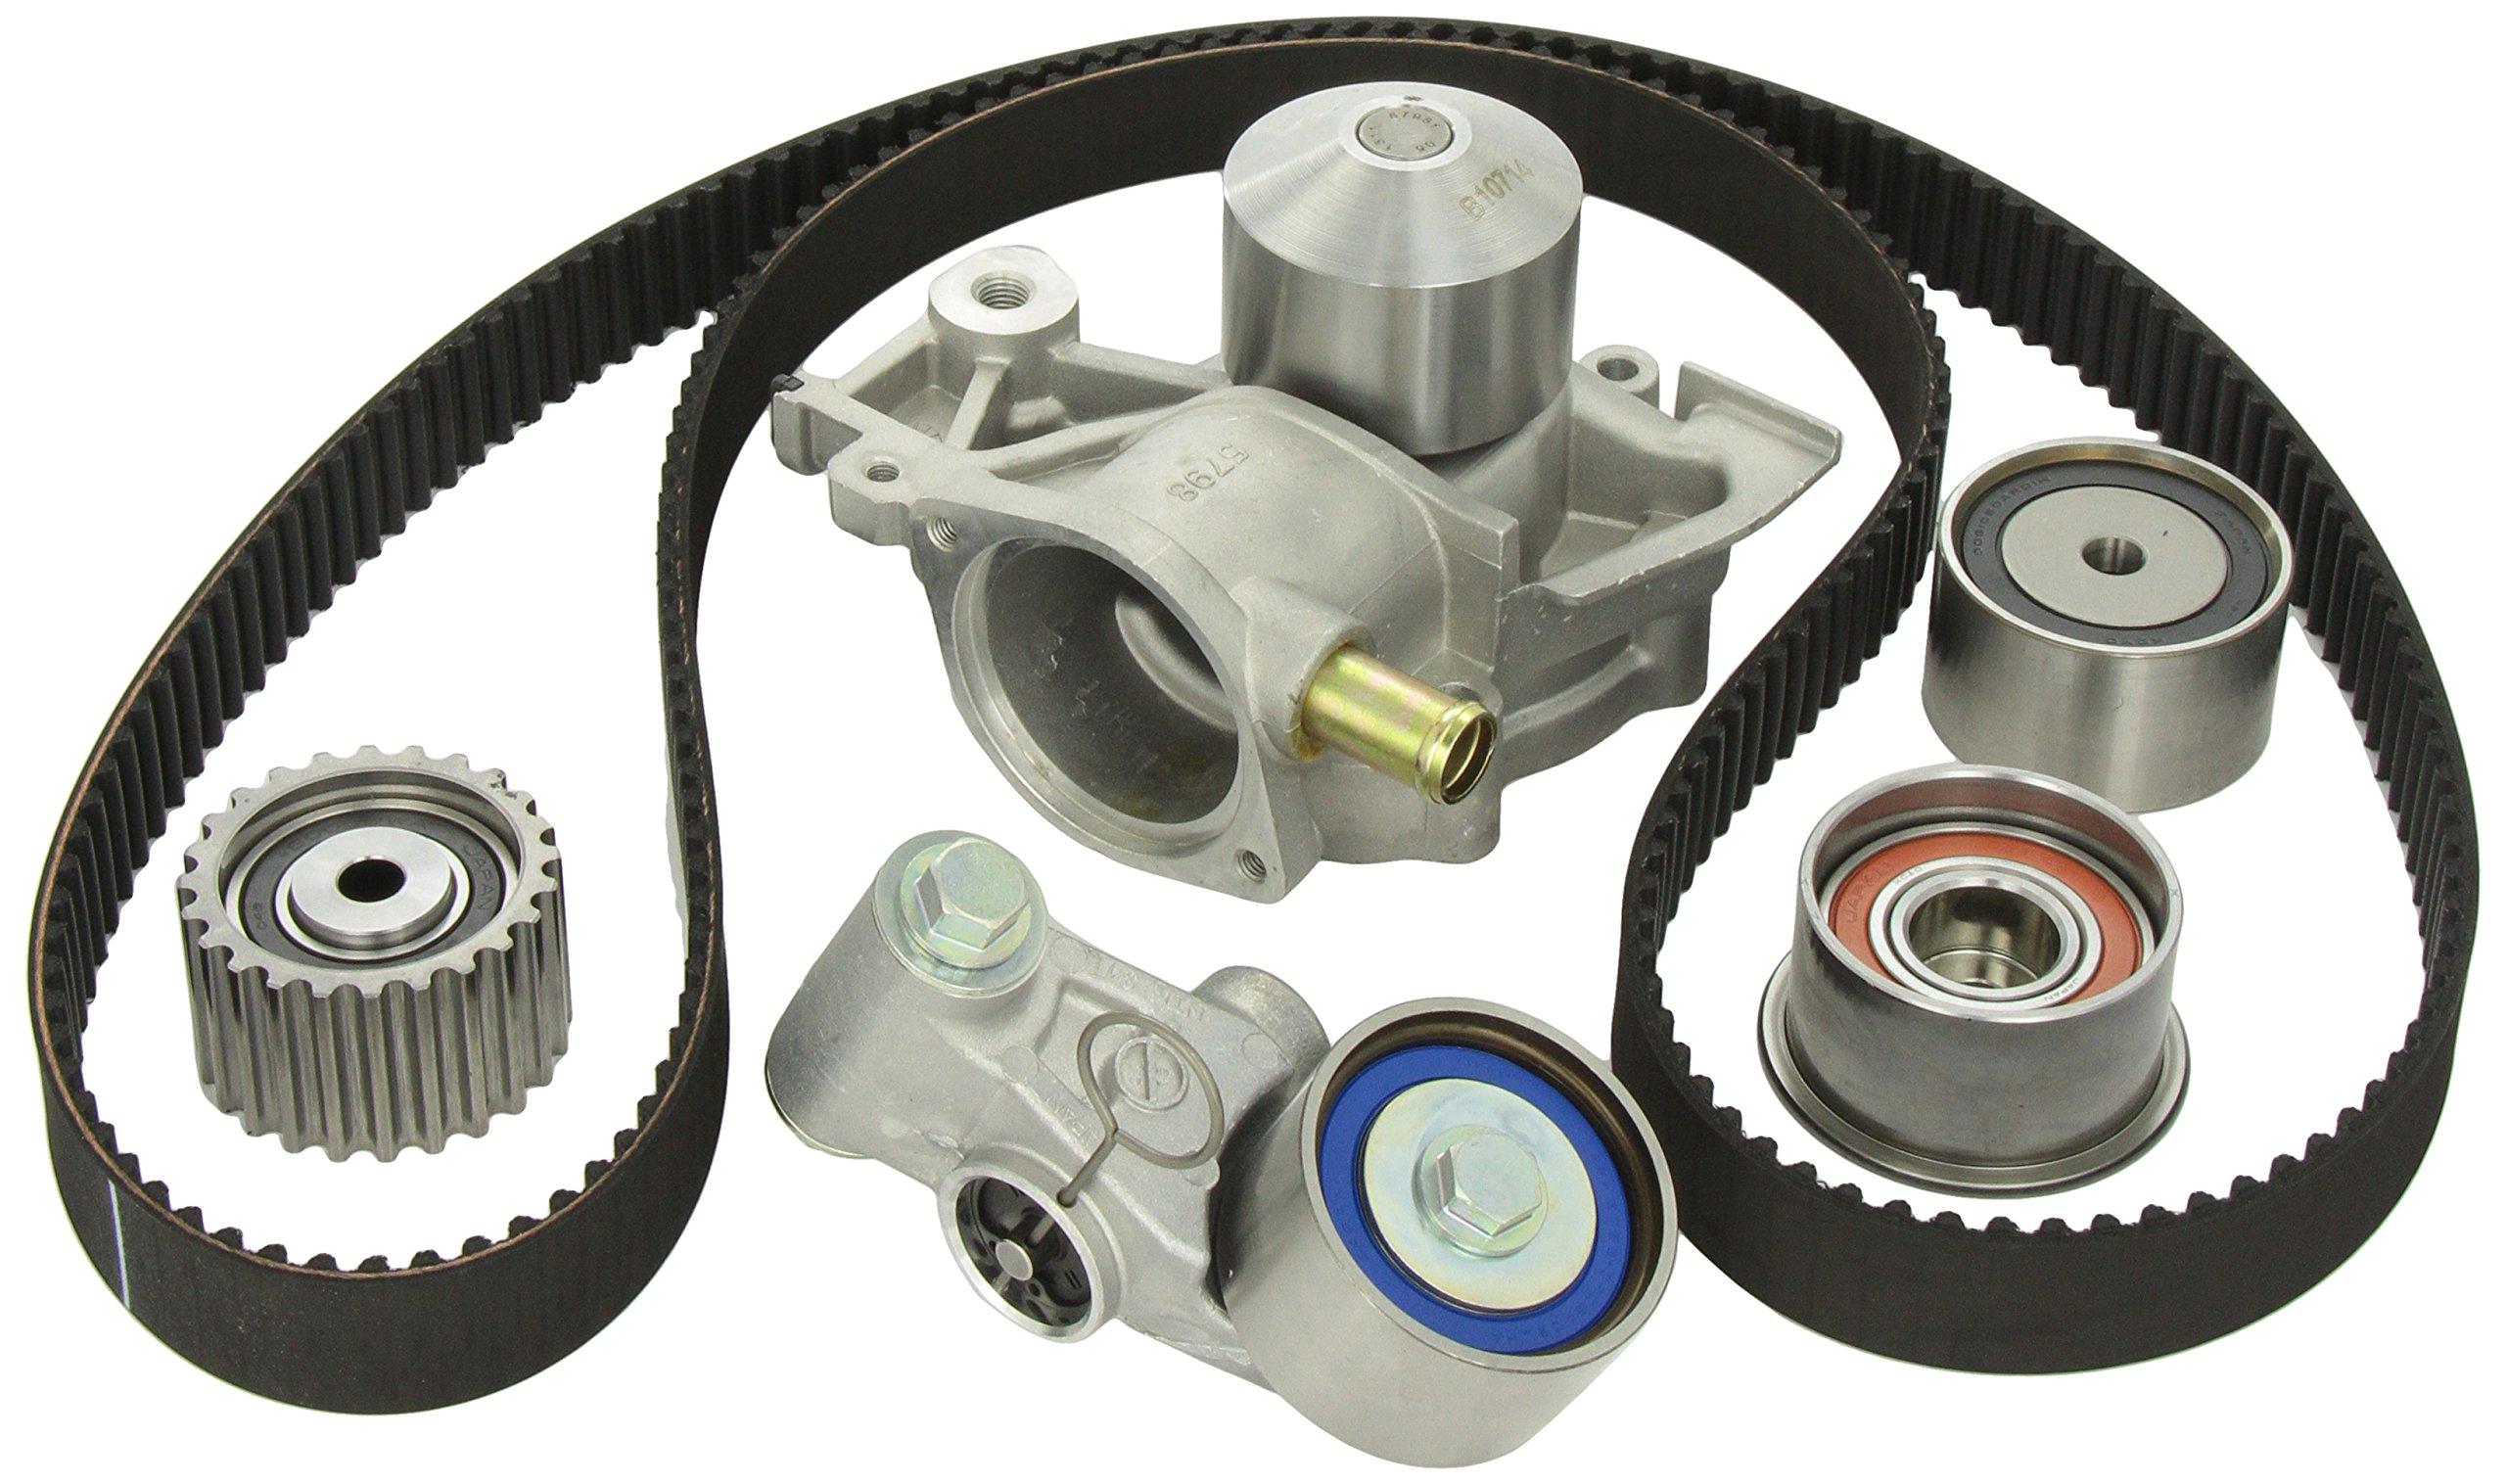 Gates TCKWP304 Engine Timing Belt Kit with Water Pump by Gates